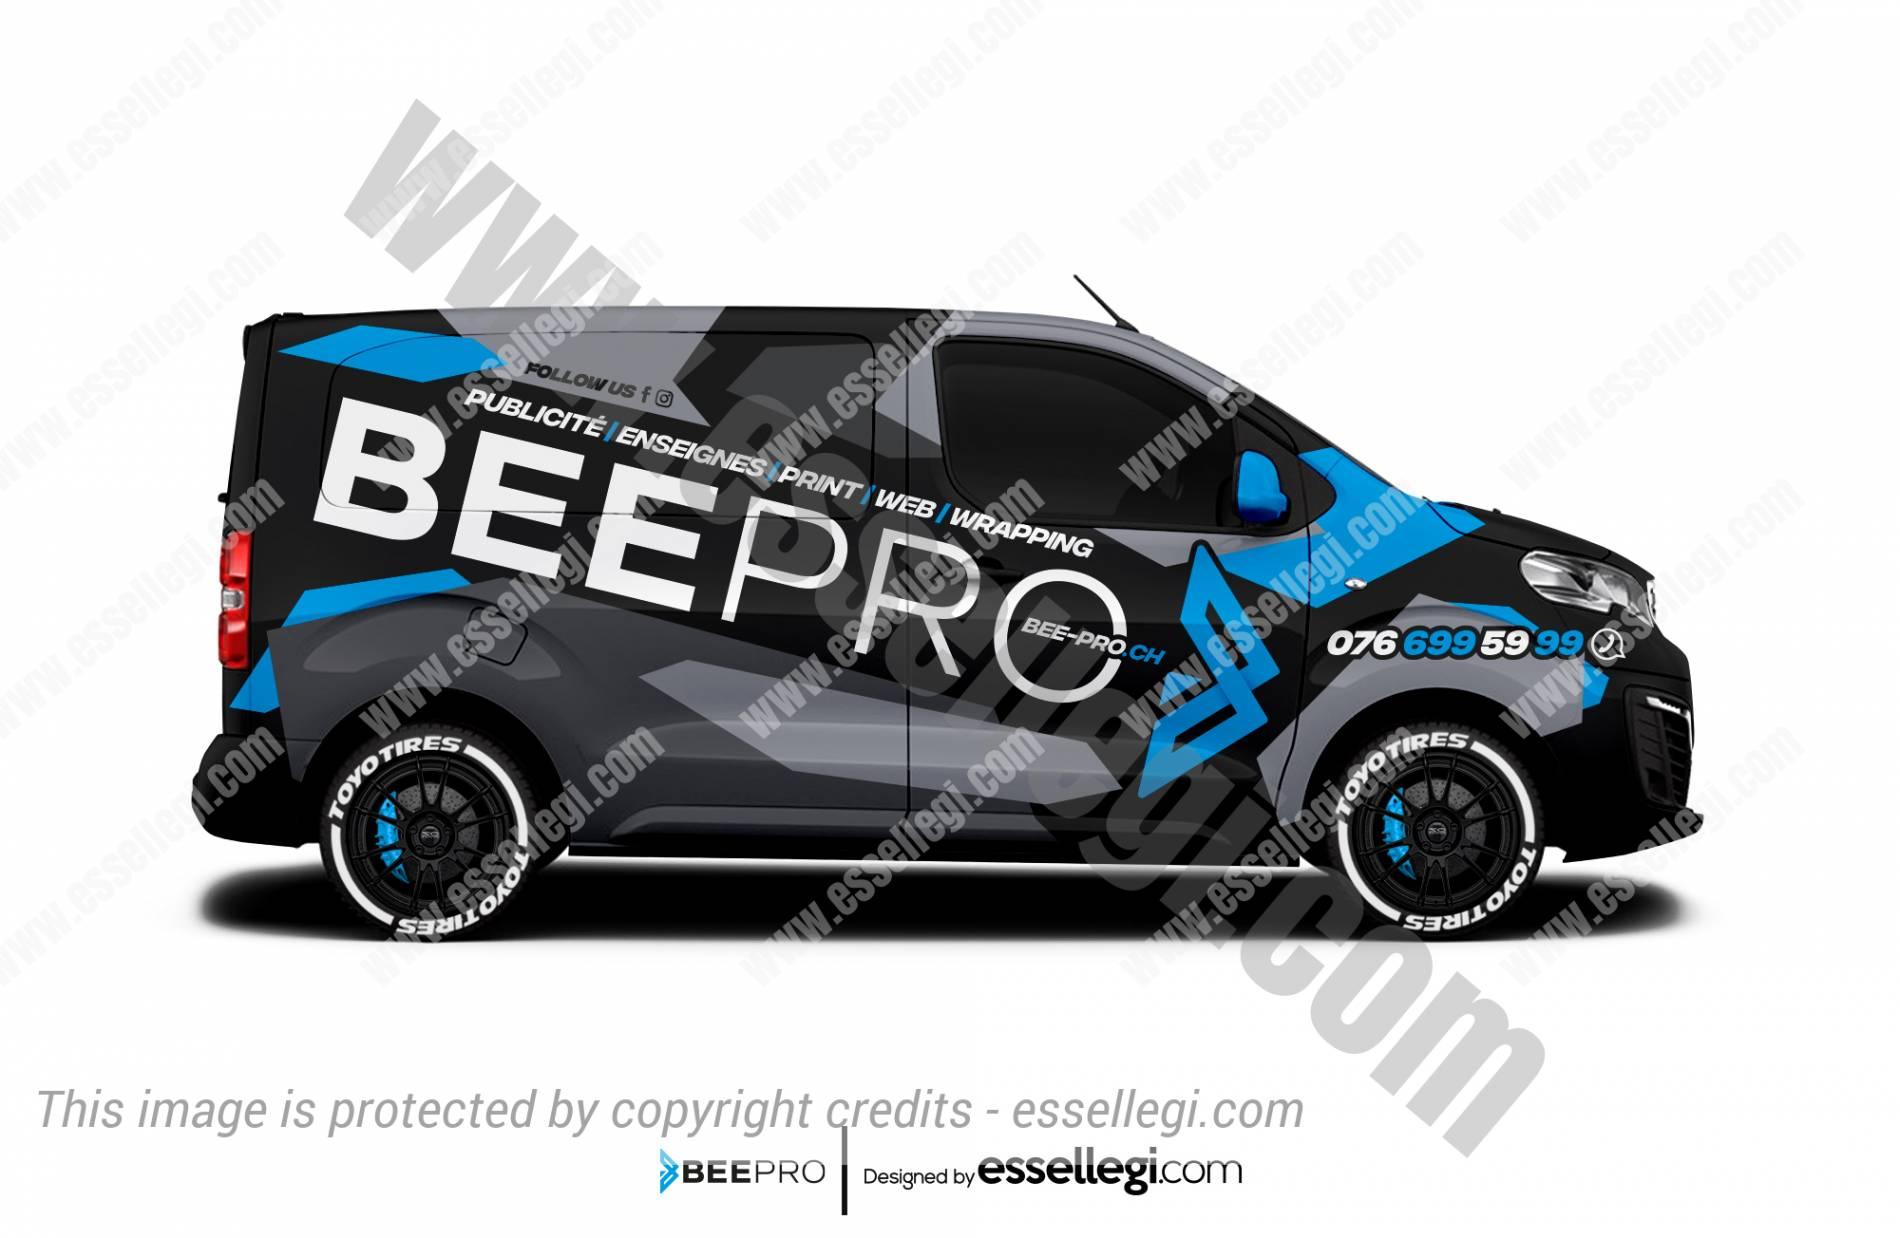 Peugeot Expert Wrap Design. Peugeot Expert Wrap | Van Wrap Design by Essellegi. Van Signs, Van Signage, Van Wrapping, Van Signwriting, Van Wrap Designer, Signs for Van, Van Logo, Van Graphic by Essellegi.